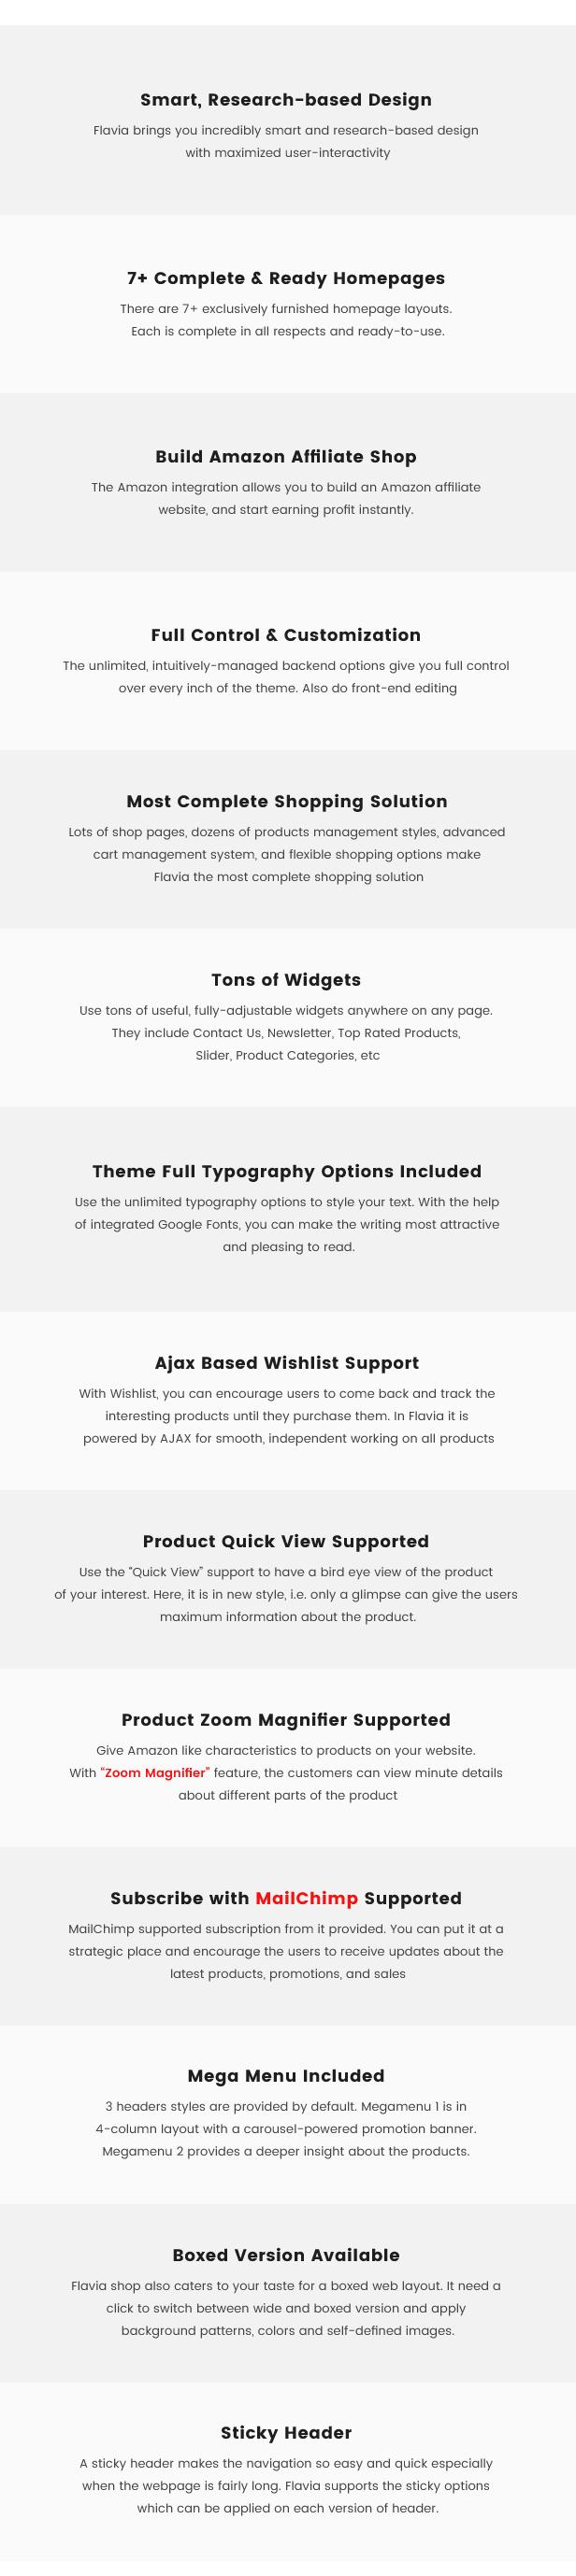 Flavia - Download Responsive WooCommerce WordPress Theme 13